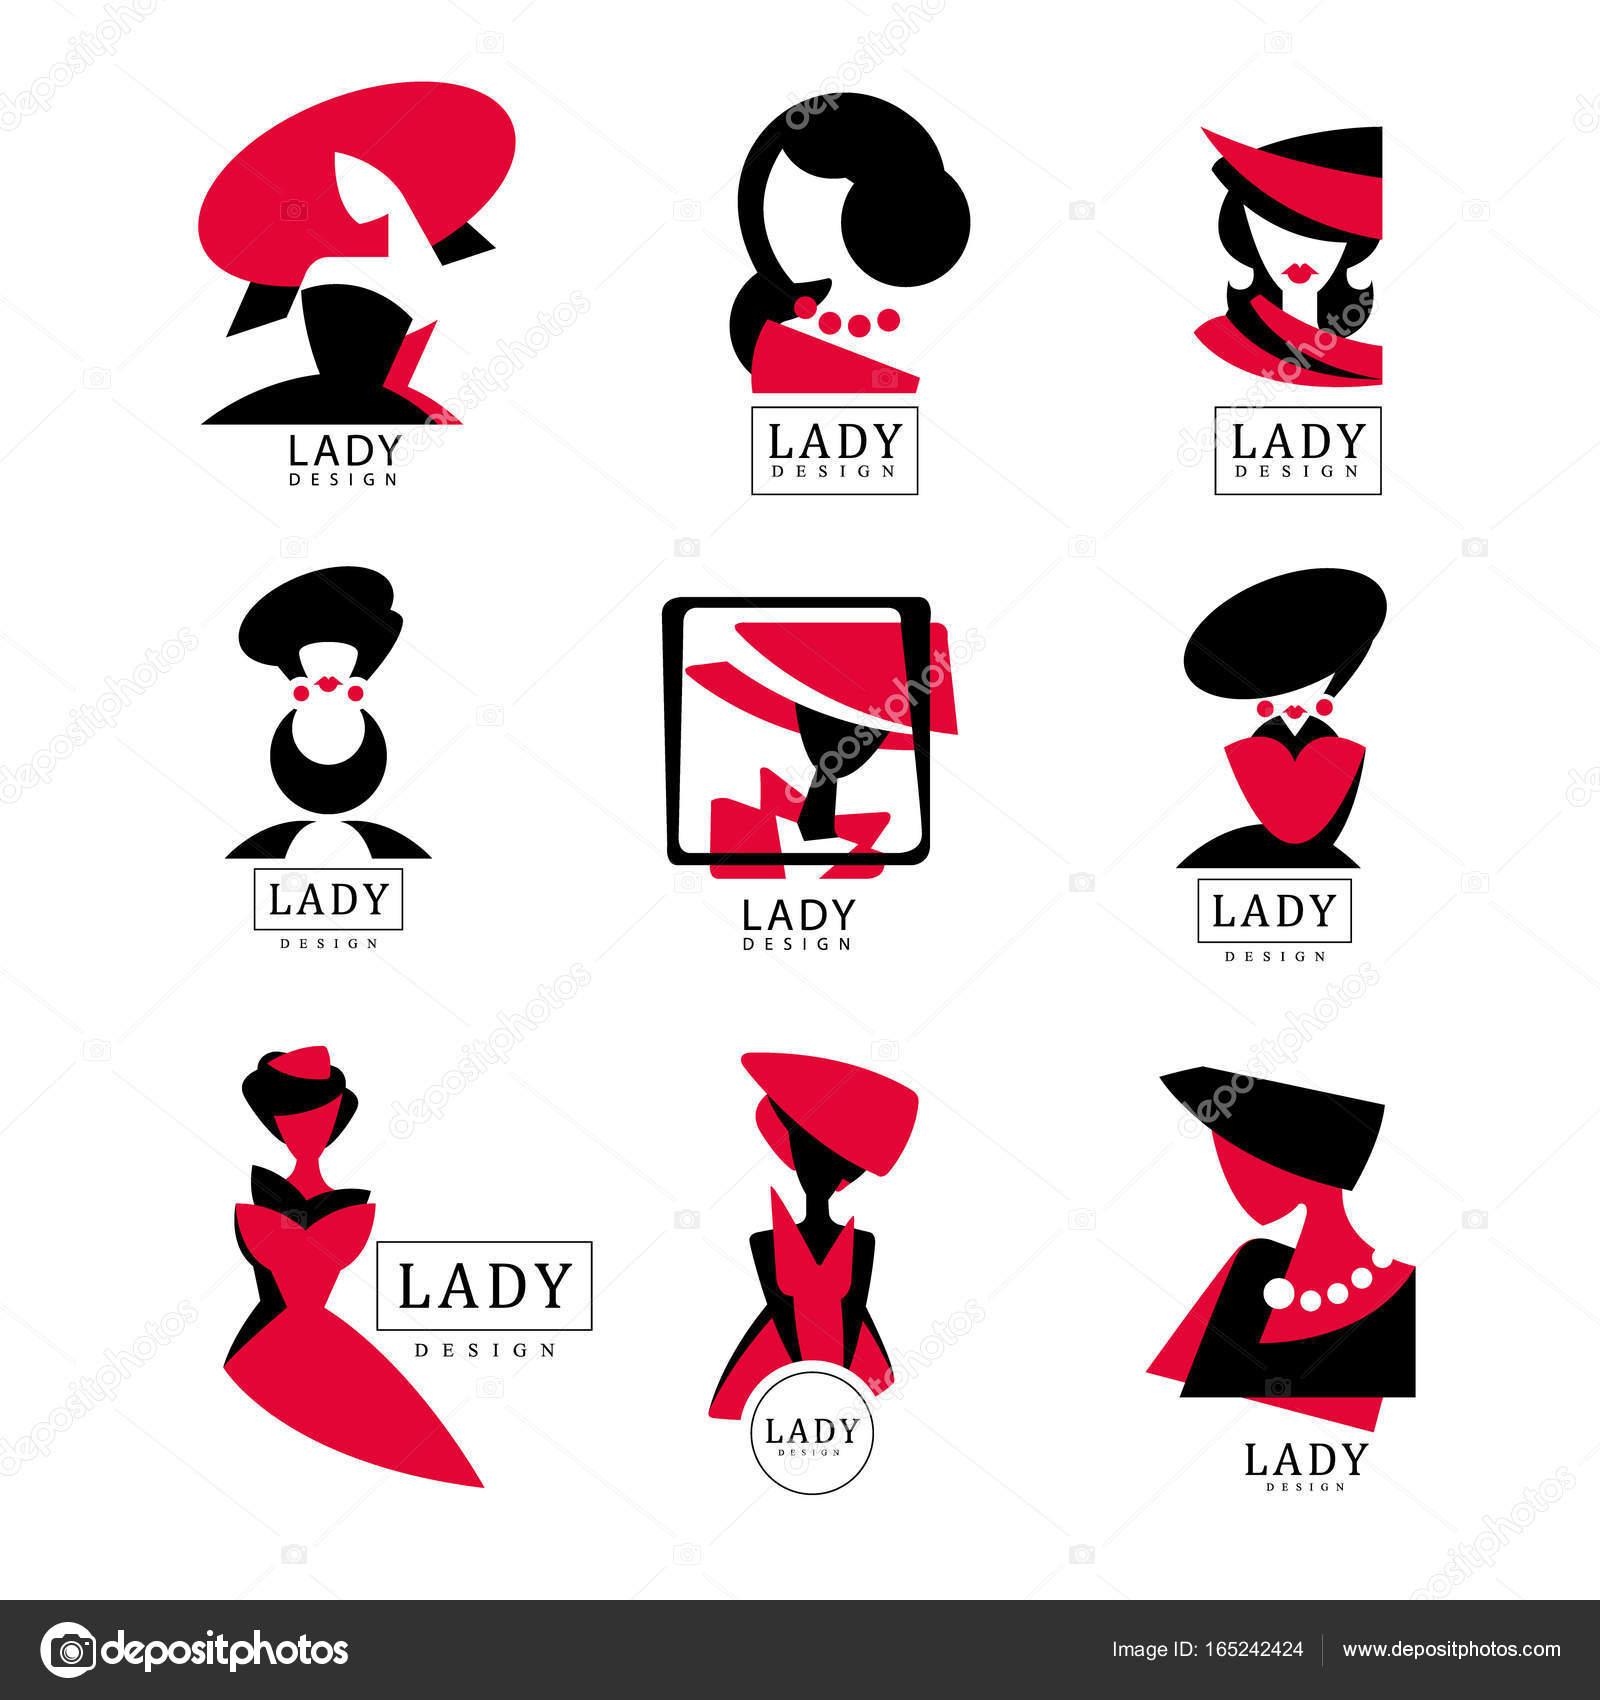 Lady logo design festgelegt vektor illustrationen fr modeboutique lady logo design festgelegt vektor illustrationen fr modeboutique damen kleidung shop thecheapjerseys Images